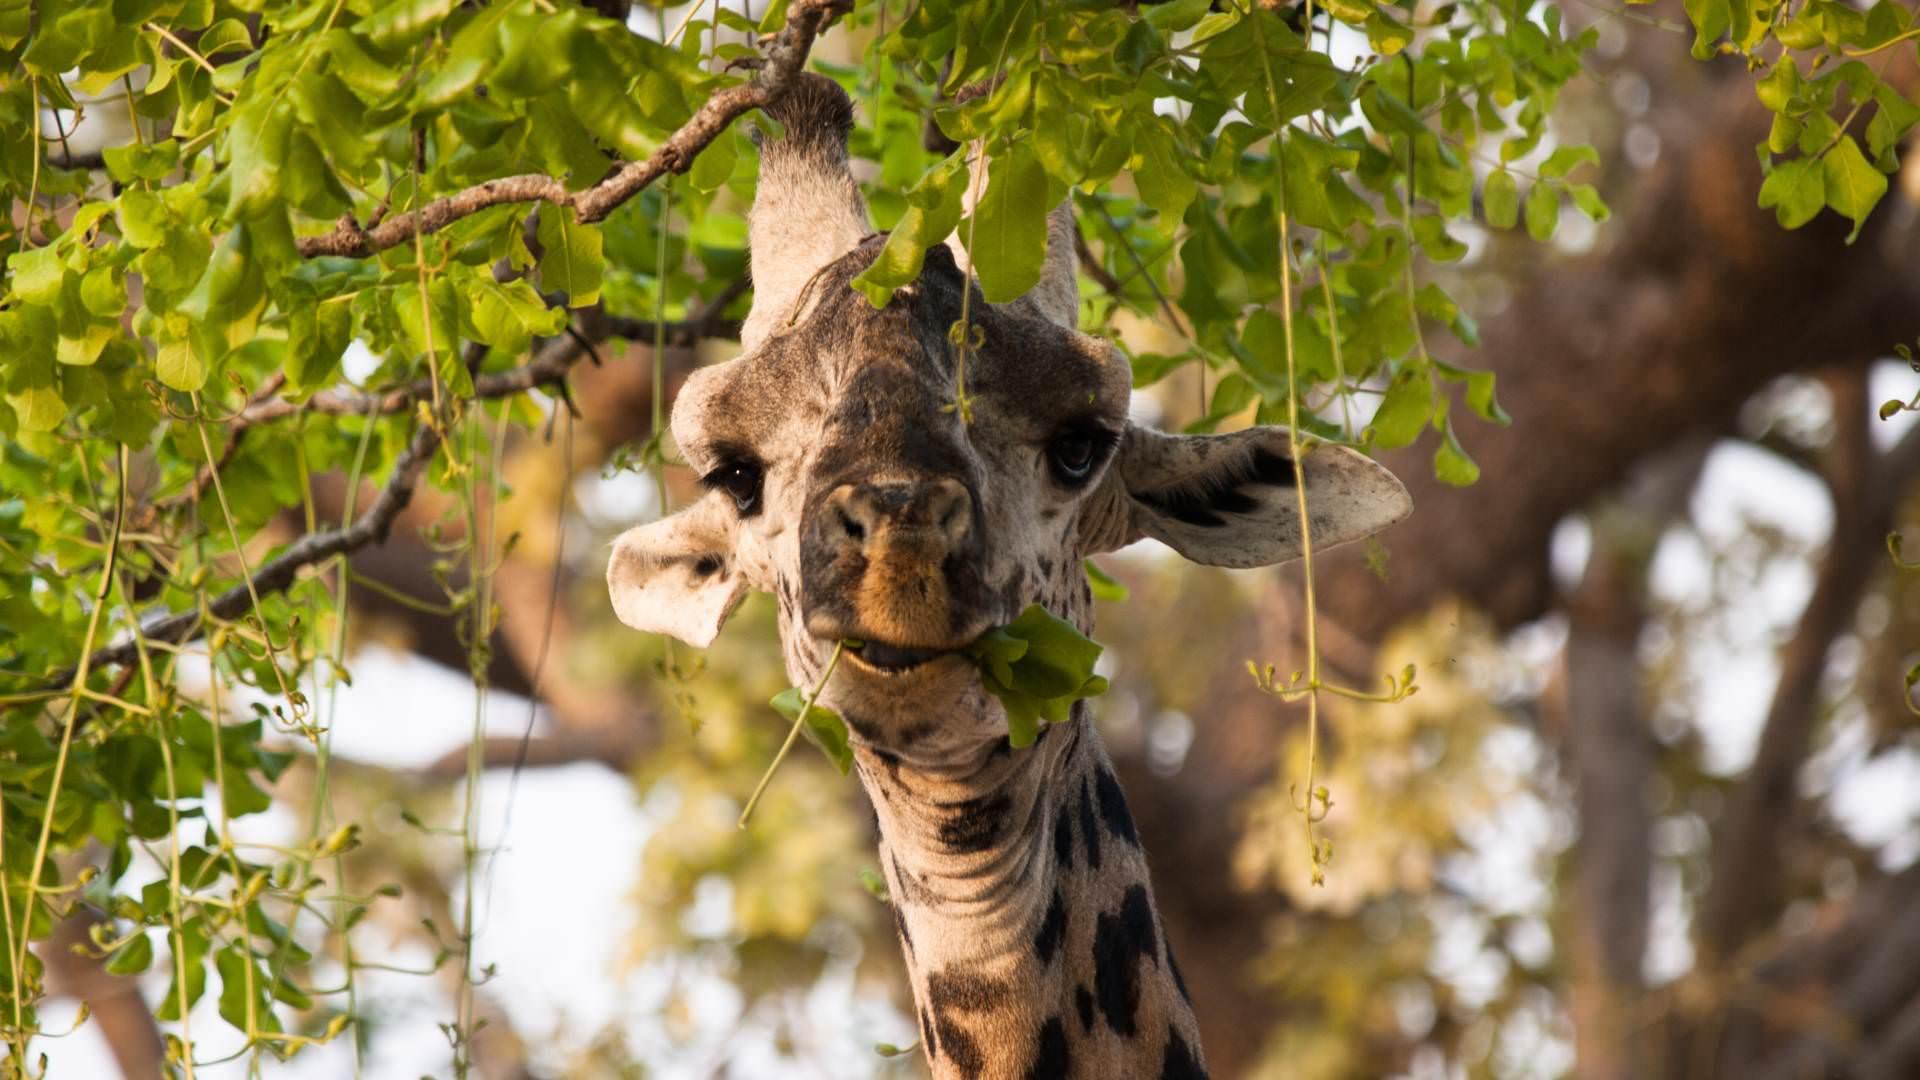 thornicrofts Giraffe luangwa valley zambia pintoafrica.com